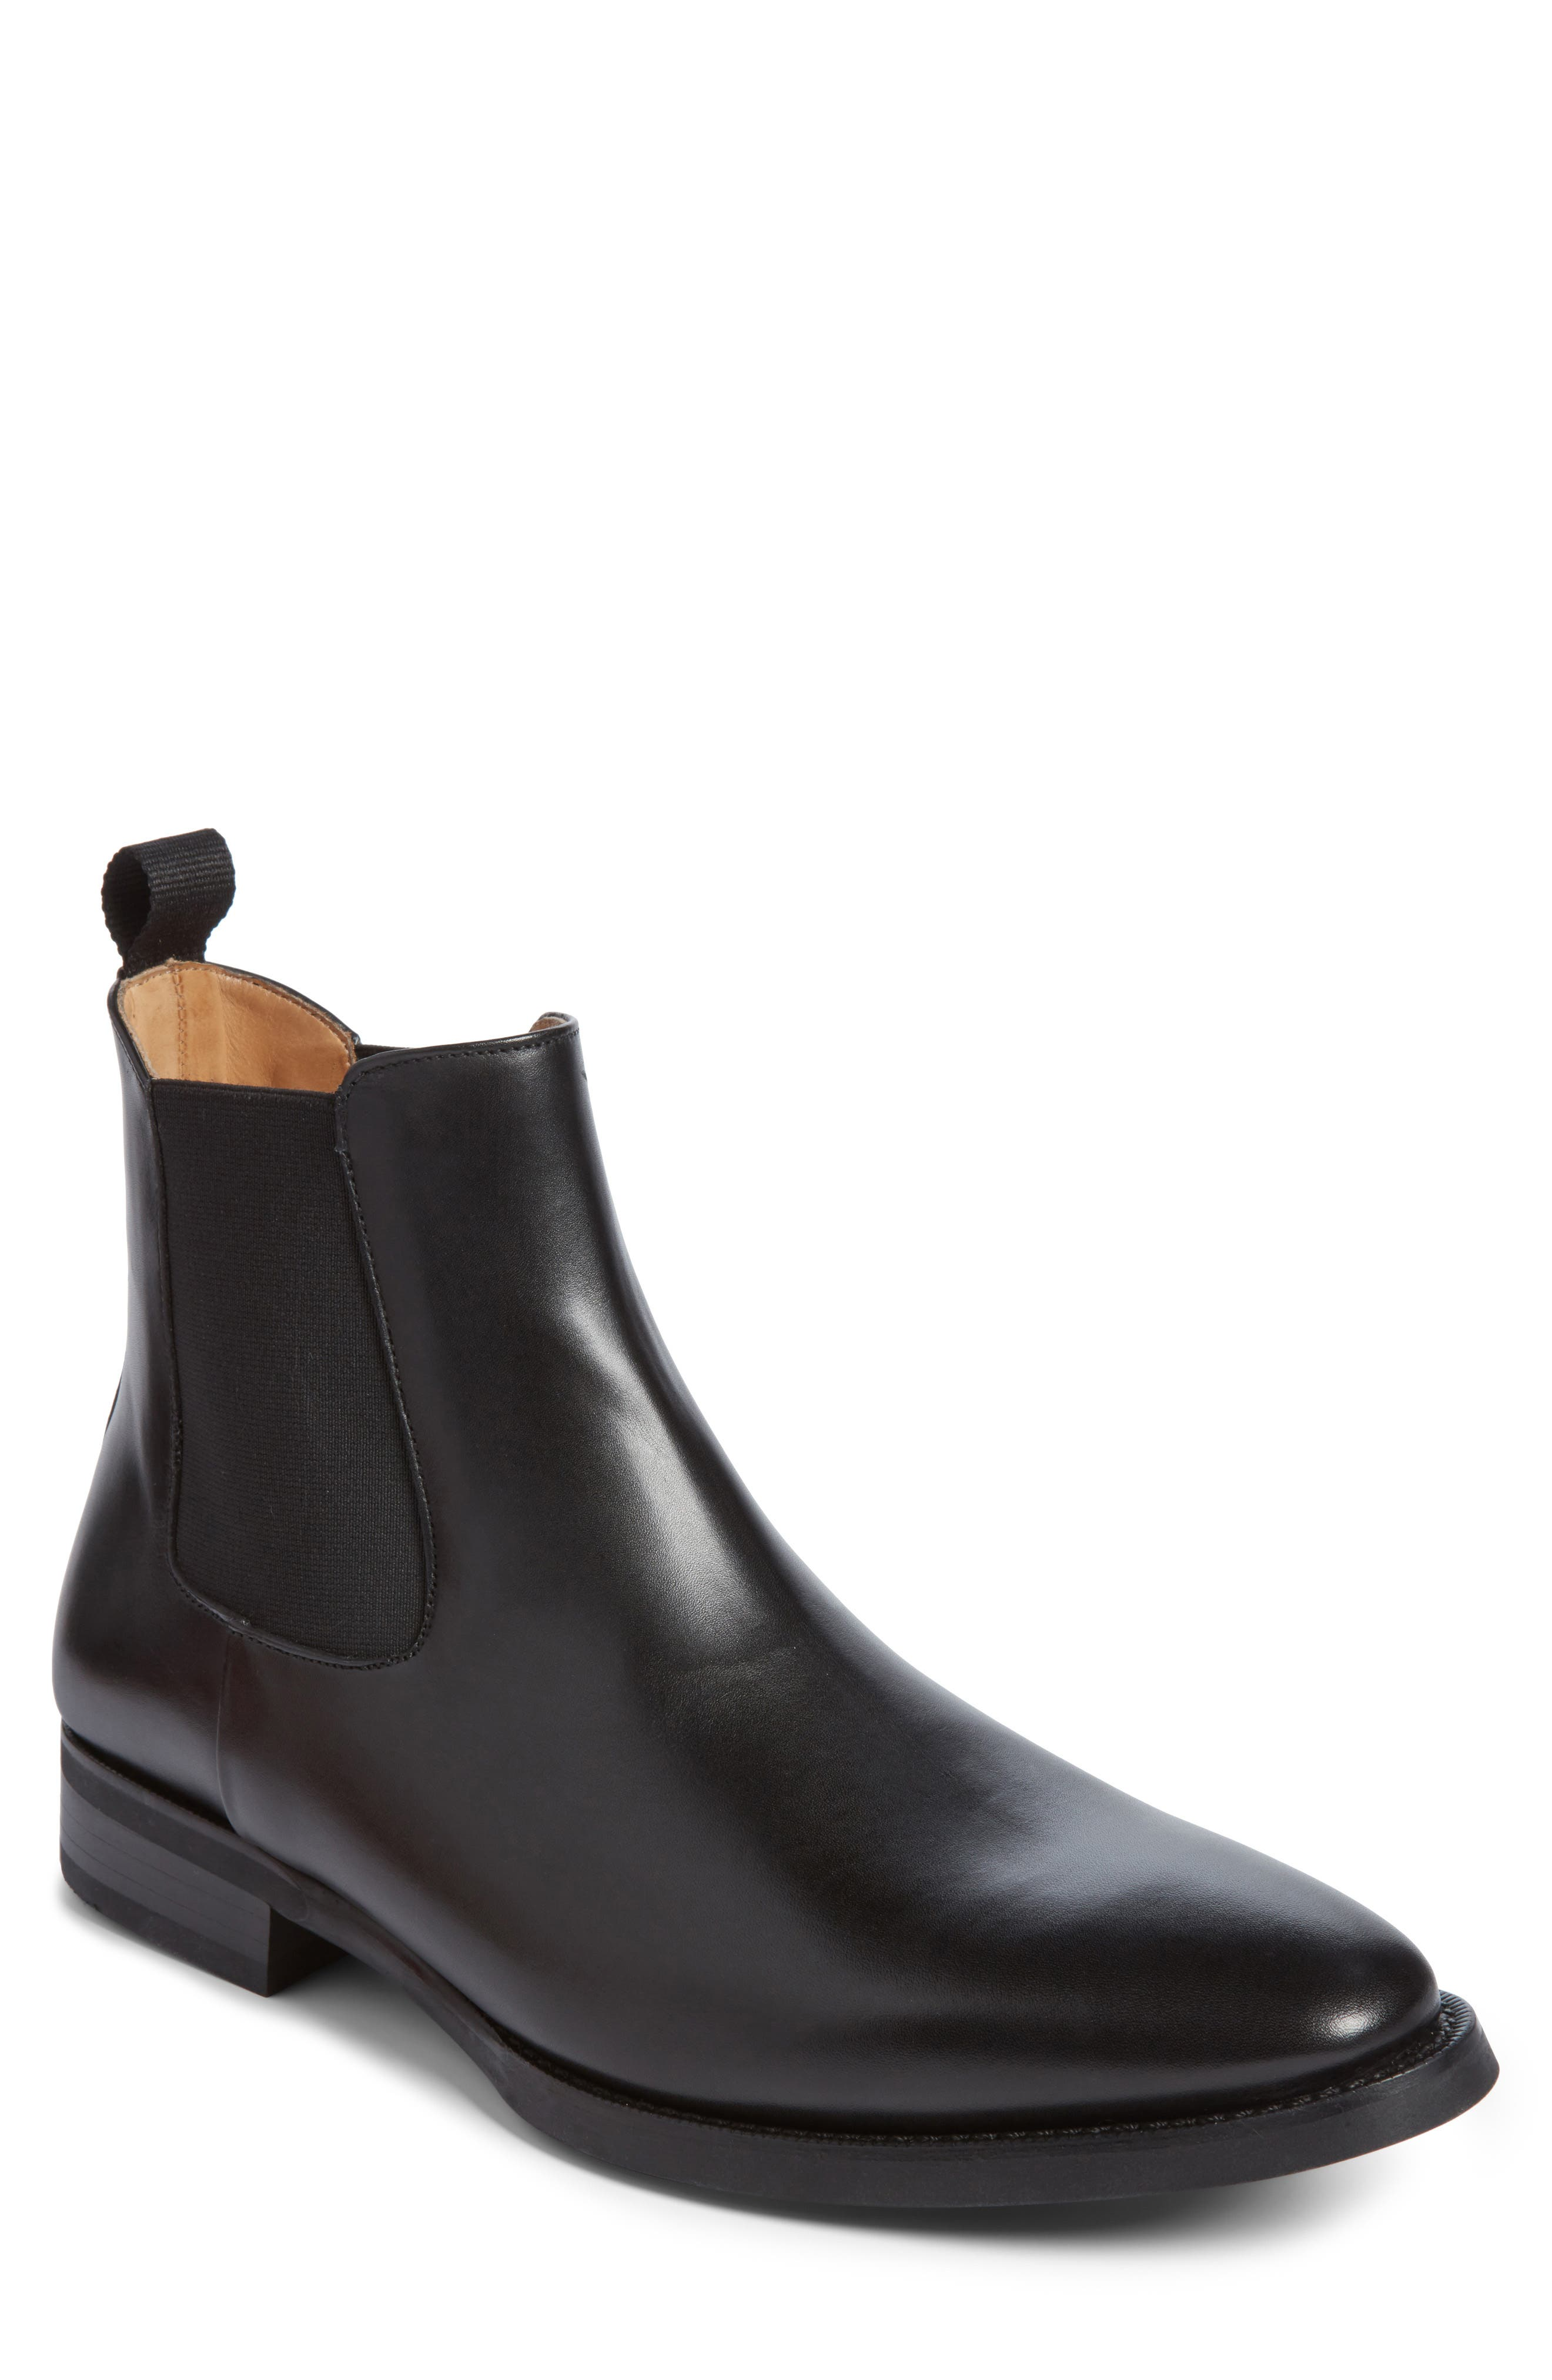 Ellis Water Resistant Chelsea Boot,                             Main thumbnail 1, color,                             Black Leather